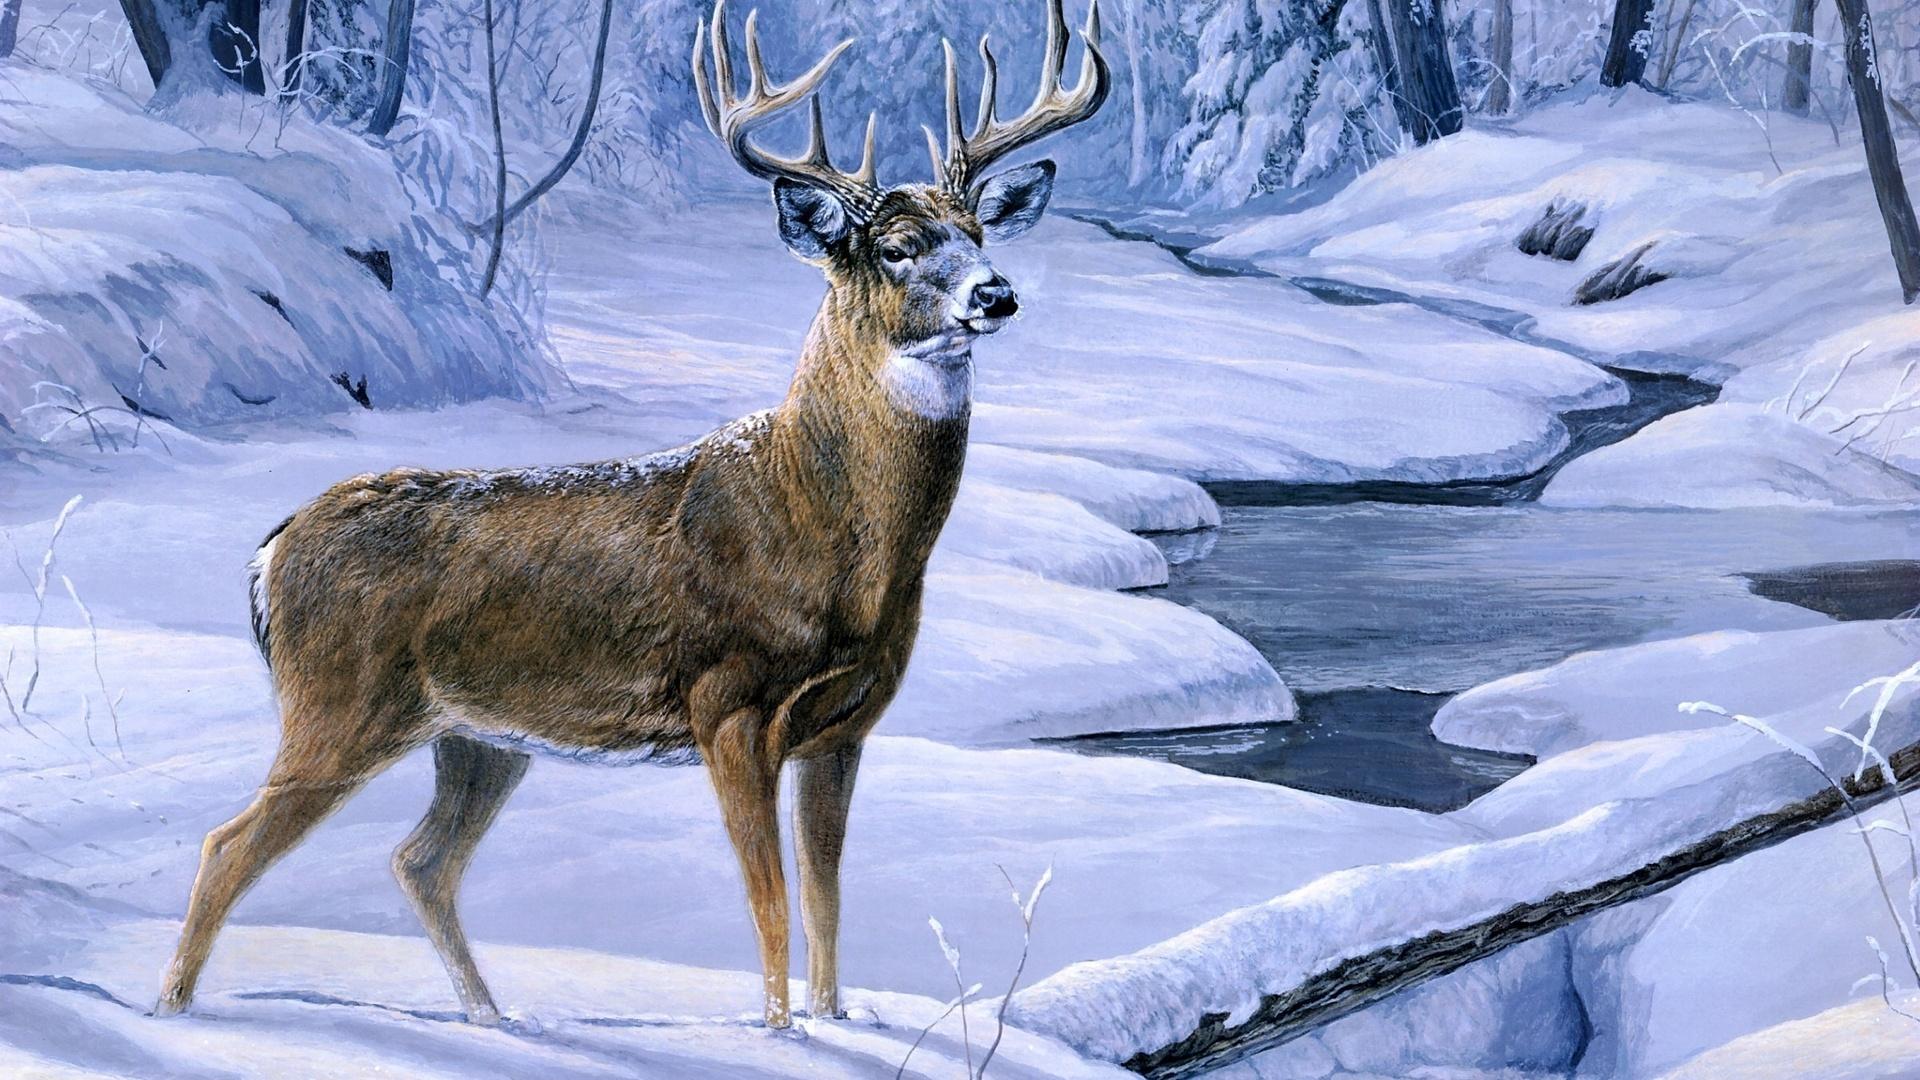 deer wallpapers deer hd wallpapers deer hd wallpapers deer hd 1920x1080